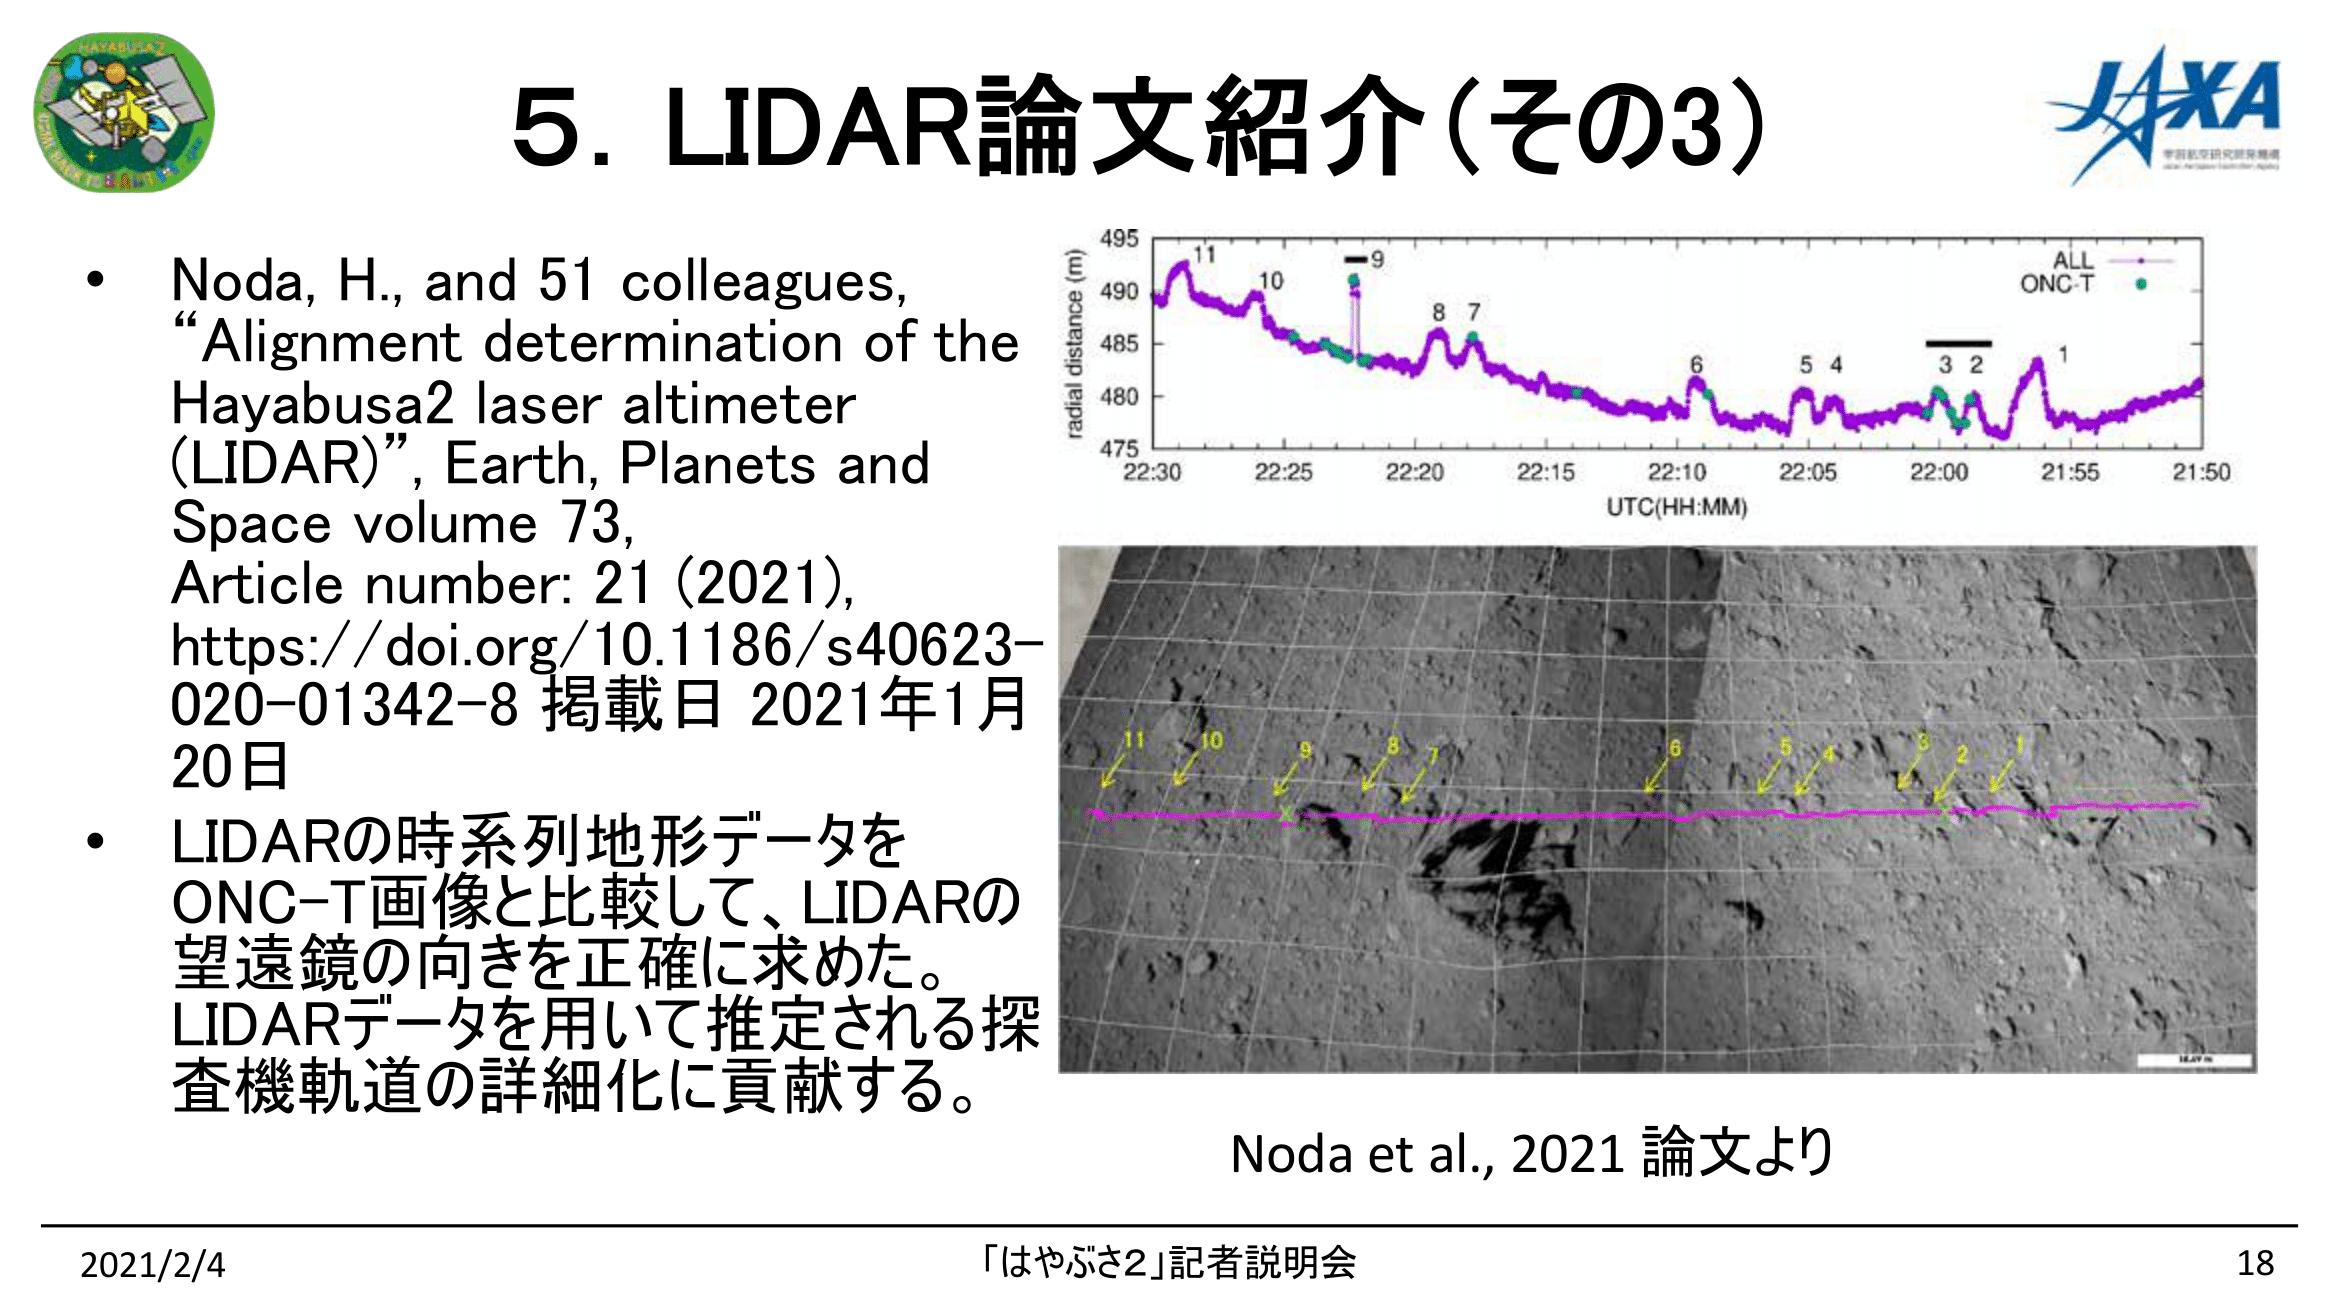 f:id:Imamura:20210204134418p:plain